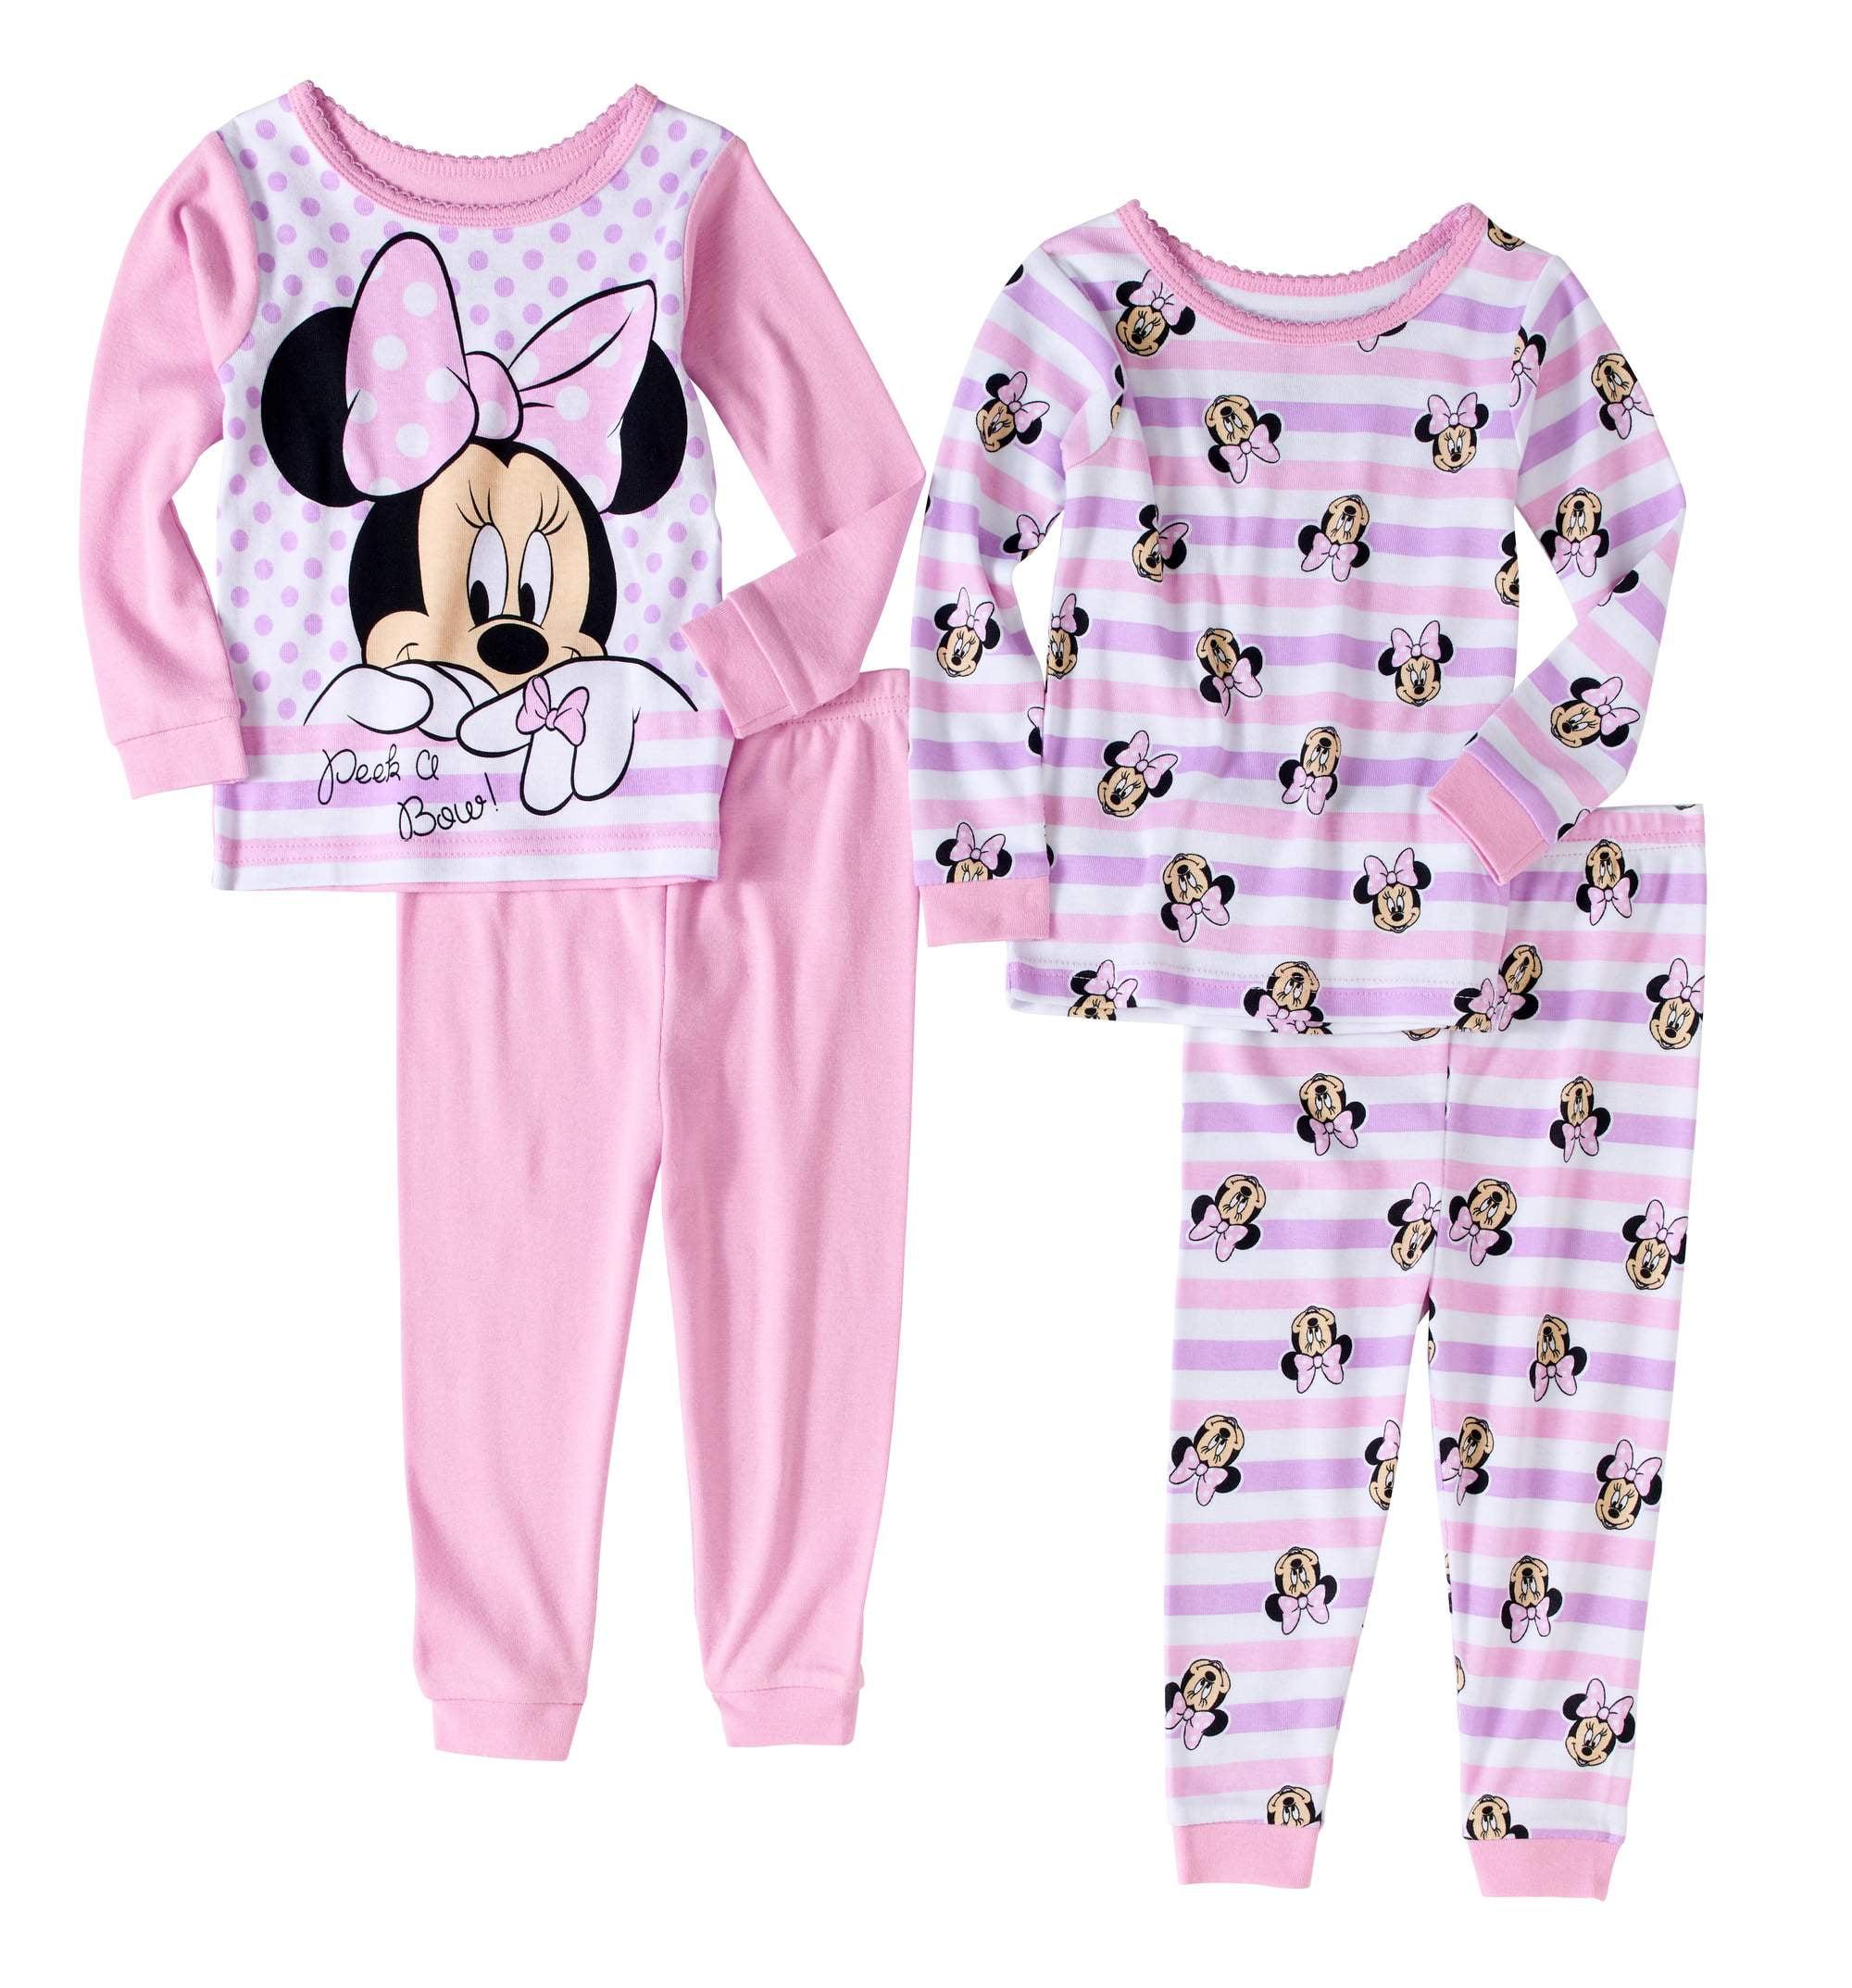 Minnie Mouse Newborn Baby Girls' Cotton Tight Fit Pajamas, 4 - Piece Set